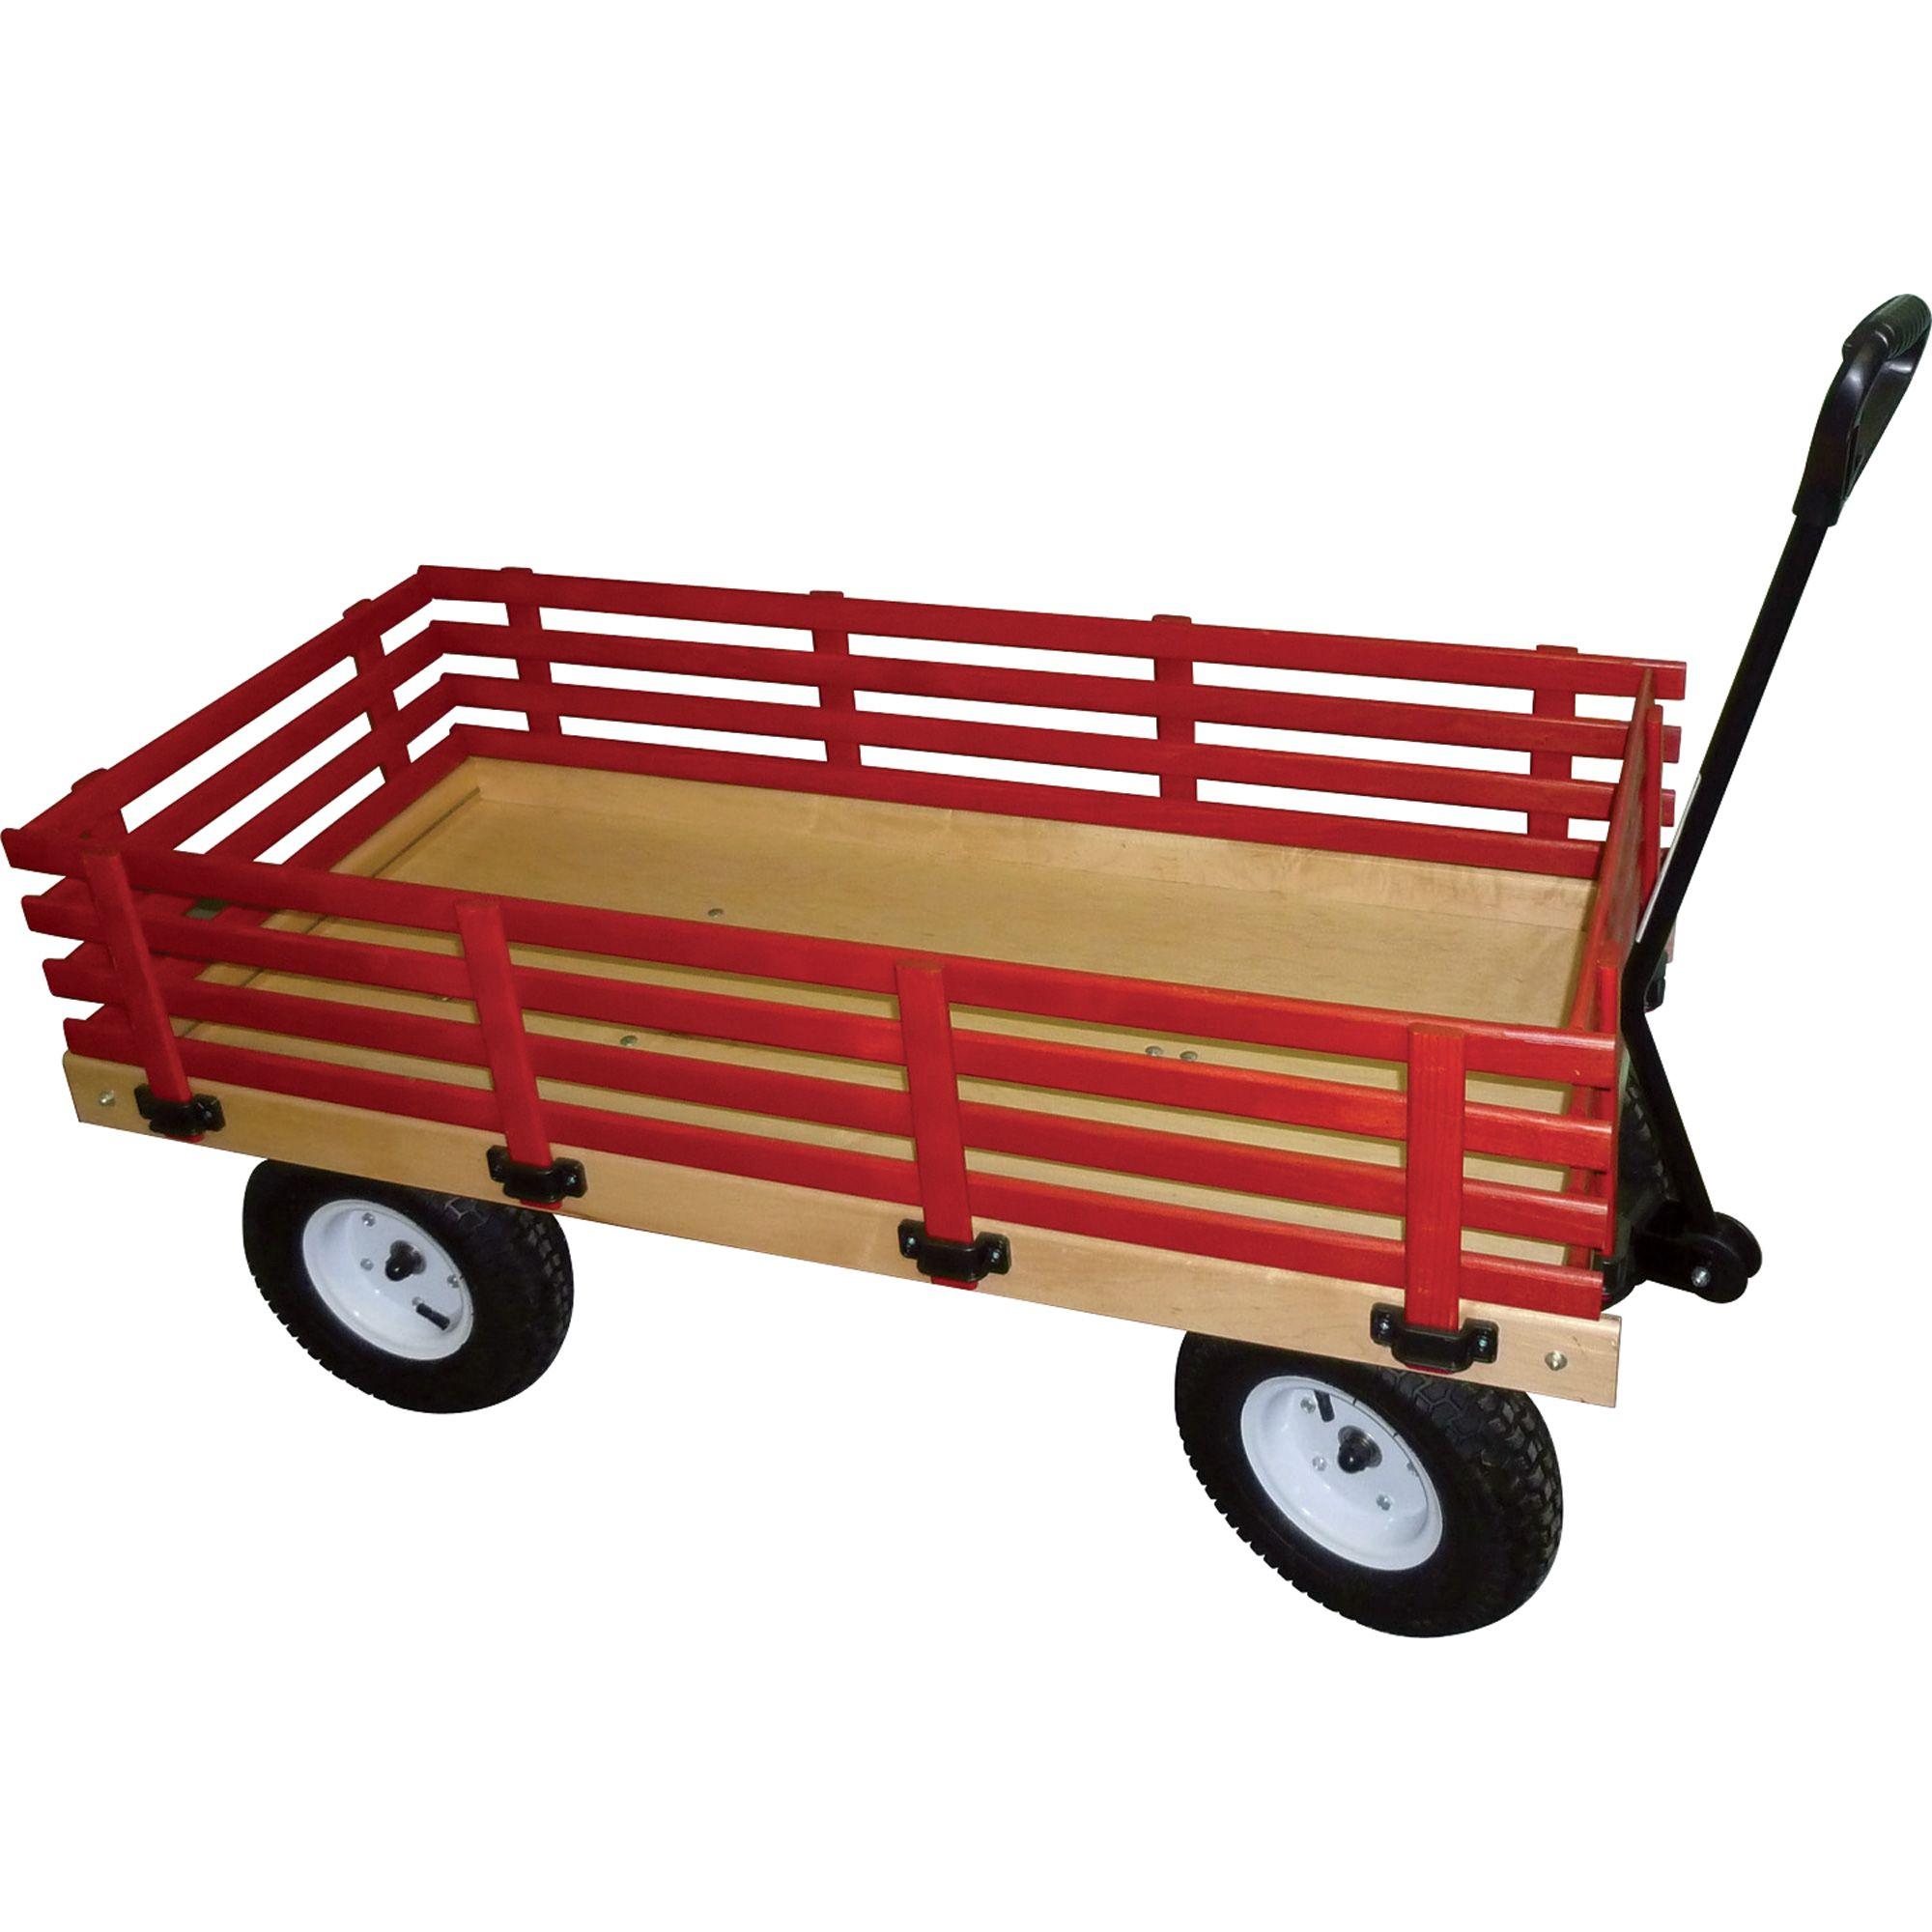 Millside Industries Garden Wagon 600lb. Capacity, 48in.L